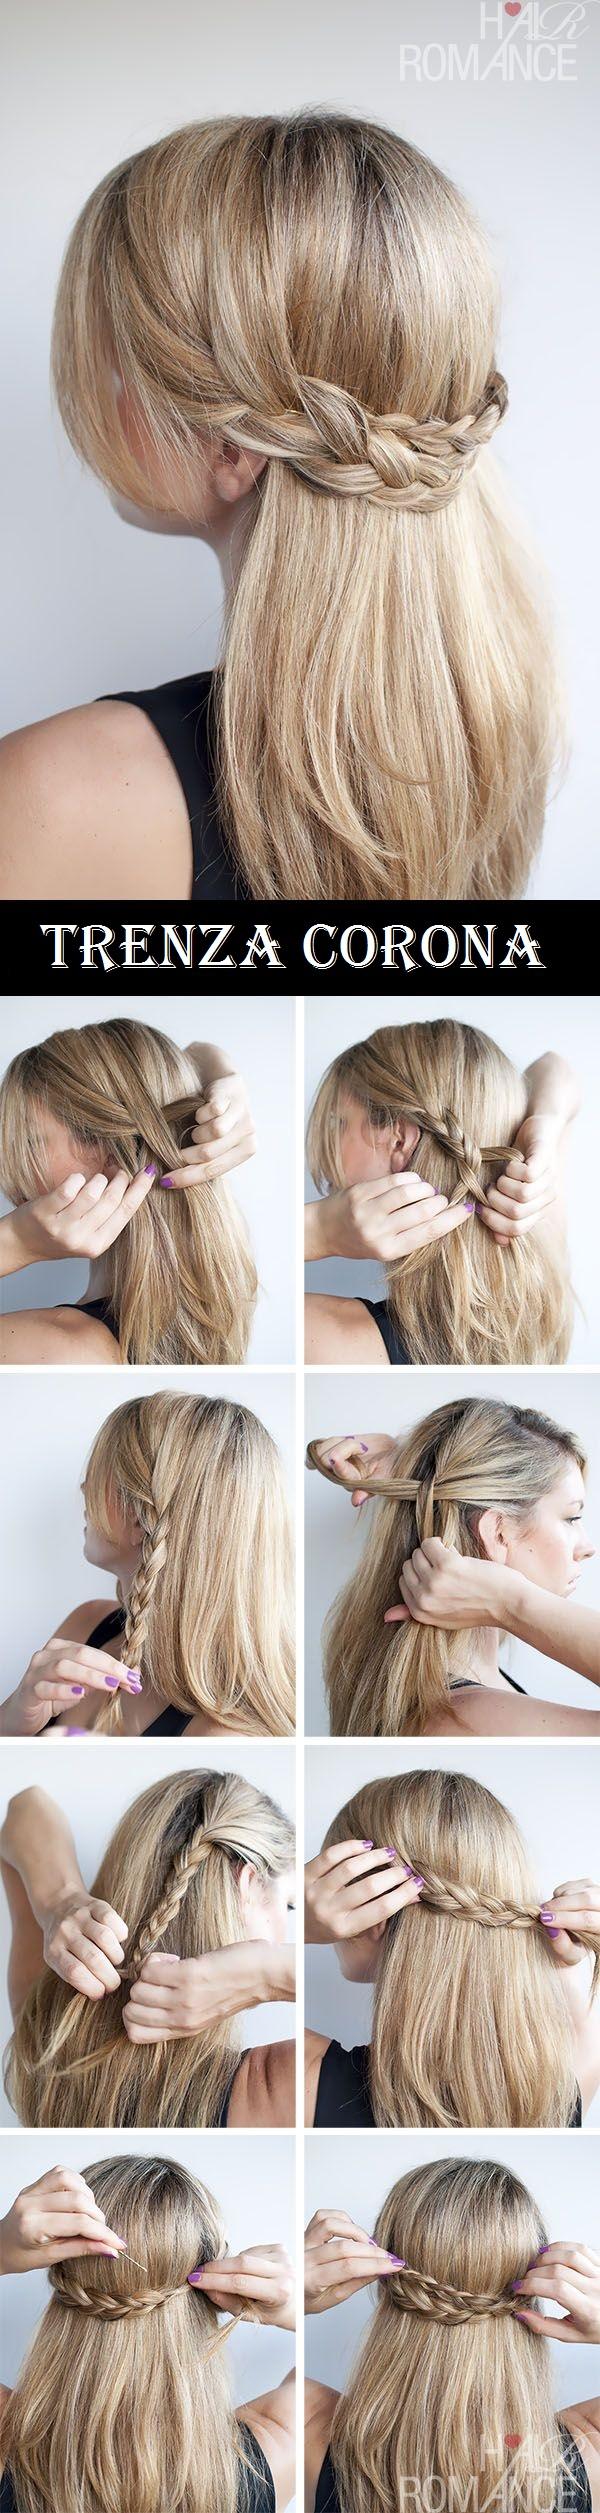 Trenza corona peinado romántico cele pinterest hair style